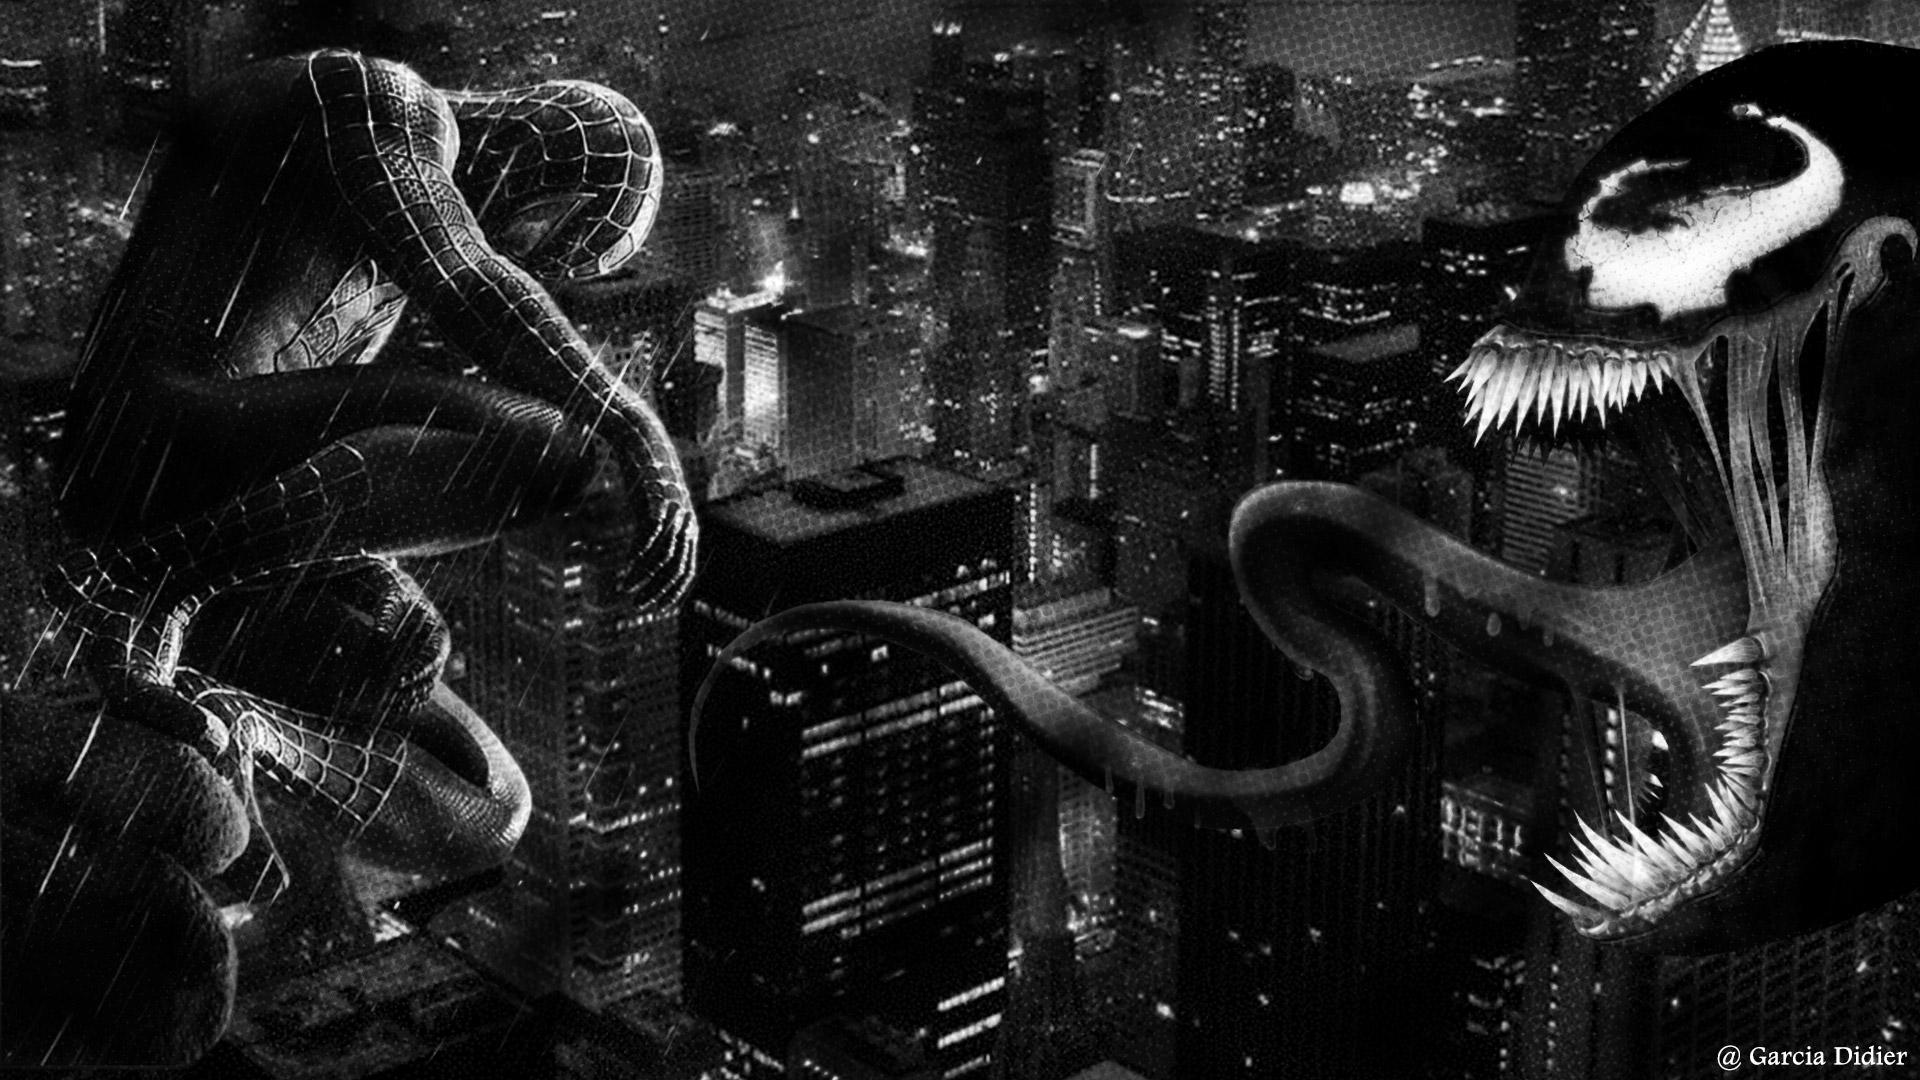 Fond ecran spiderman by dgarcia57 on deviantart for Fond ecran style